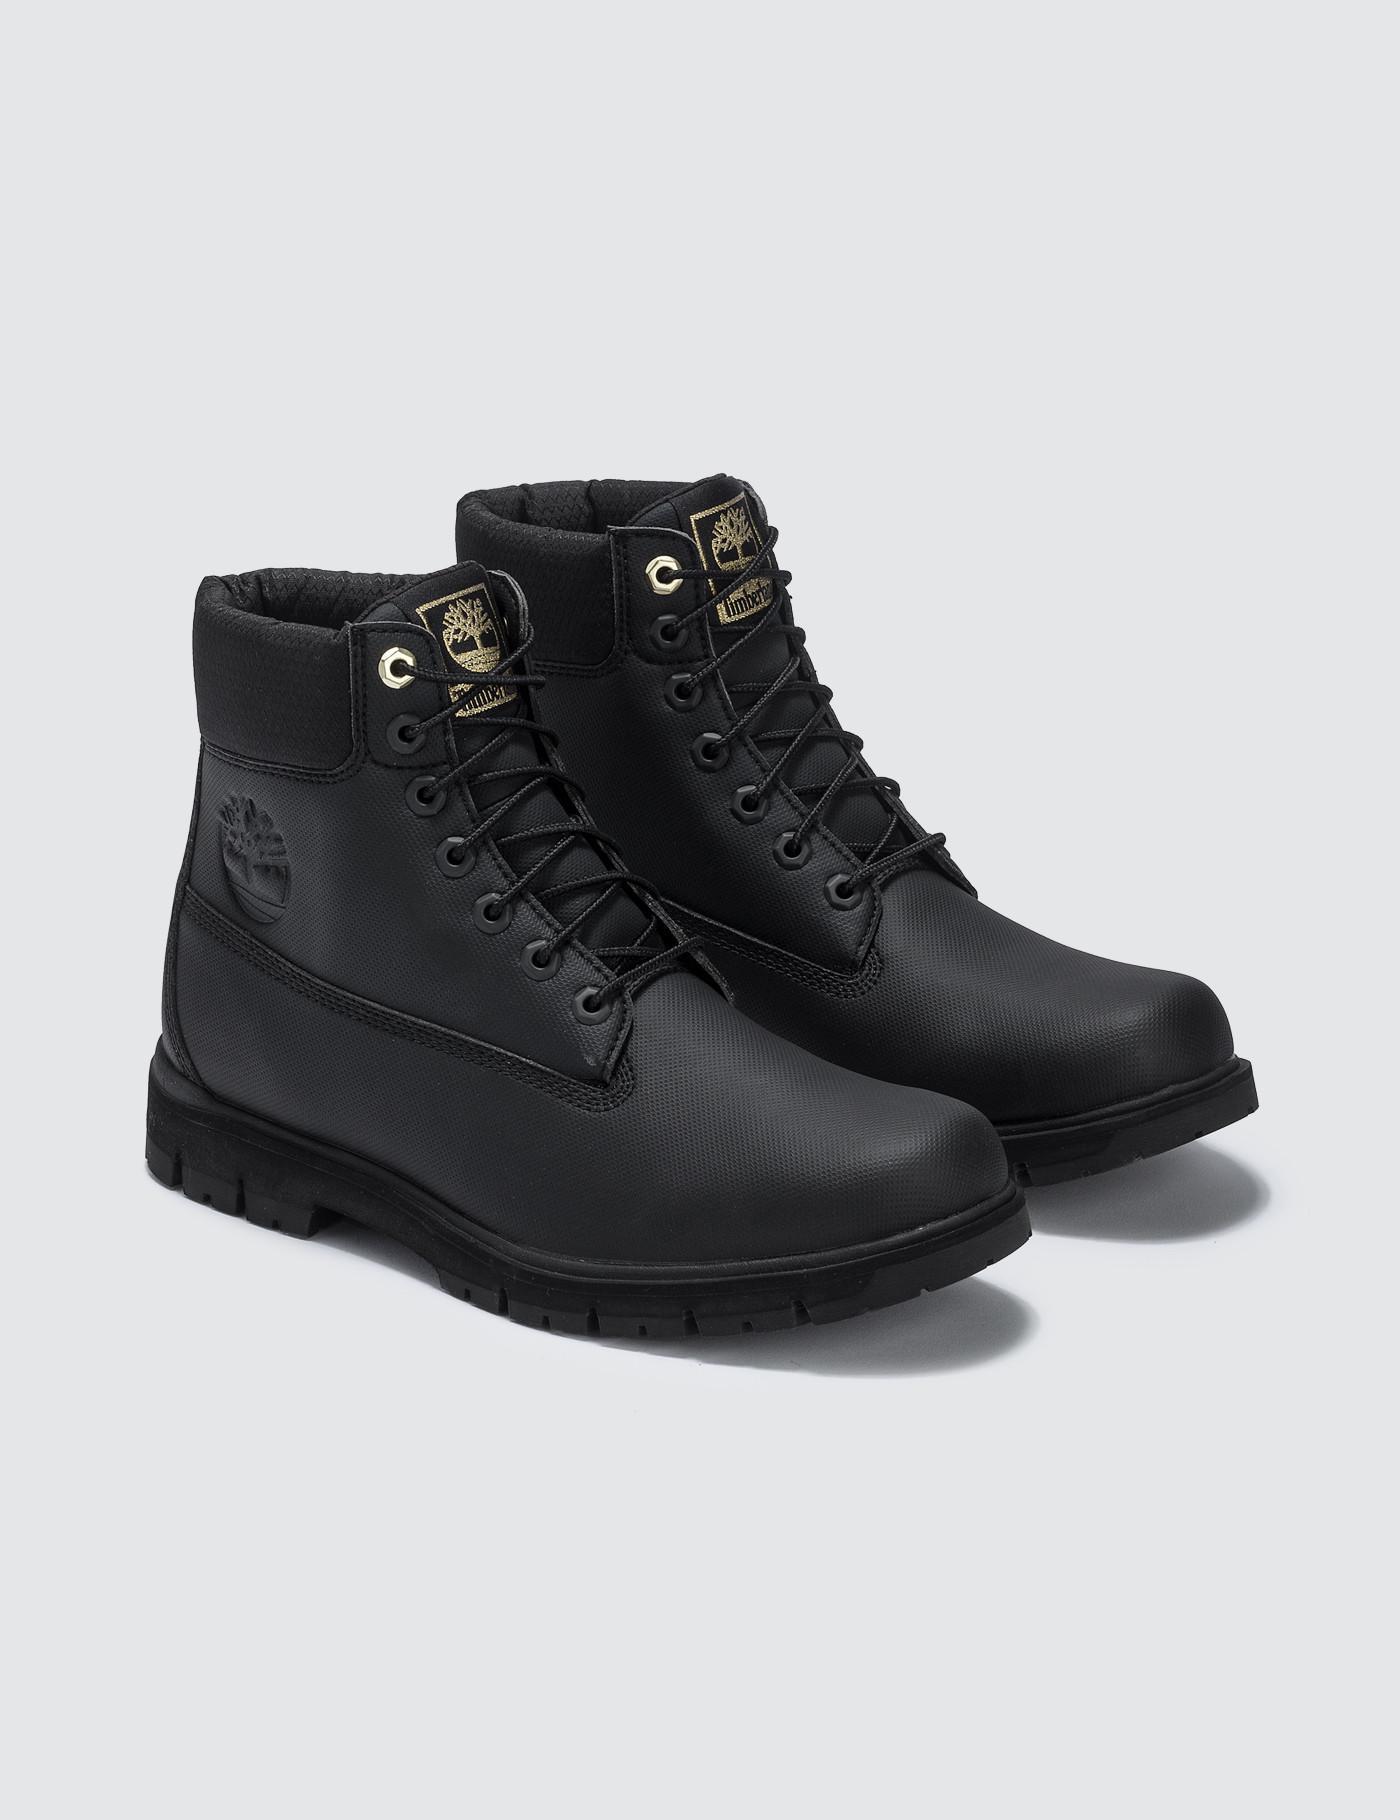 4a65cd317ec Timberland Black